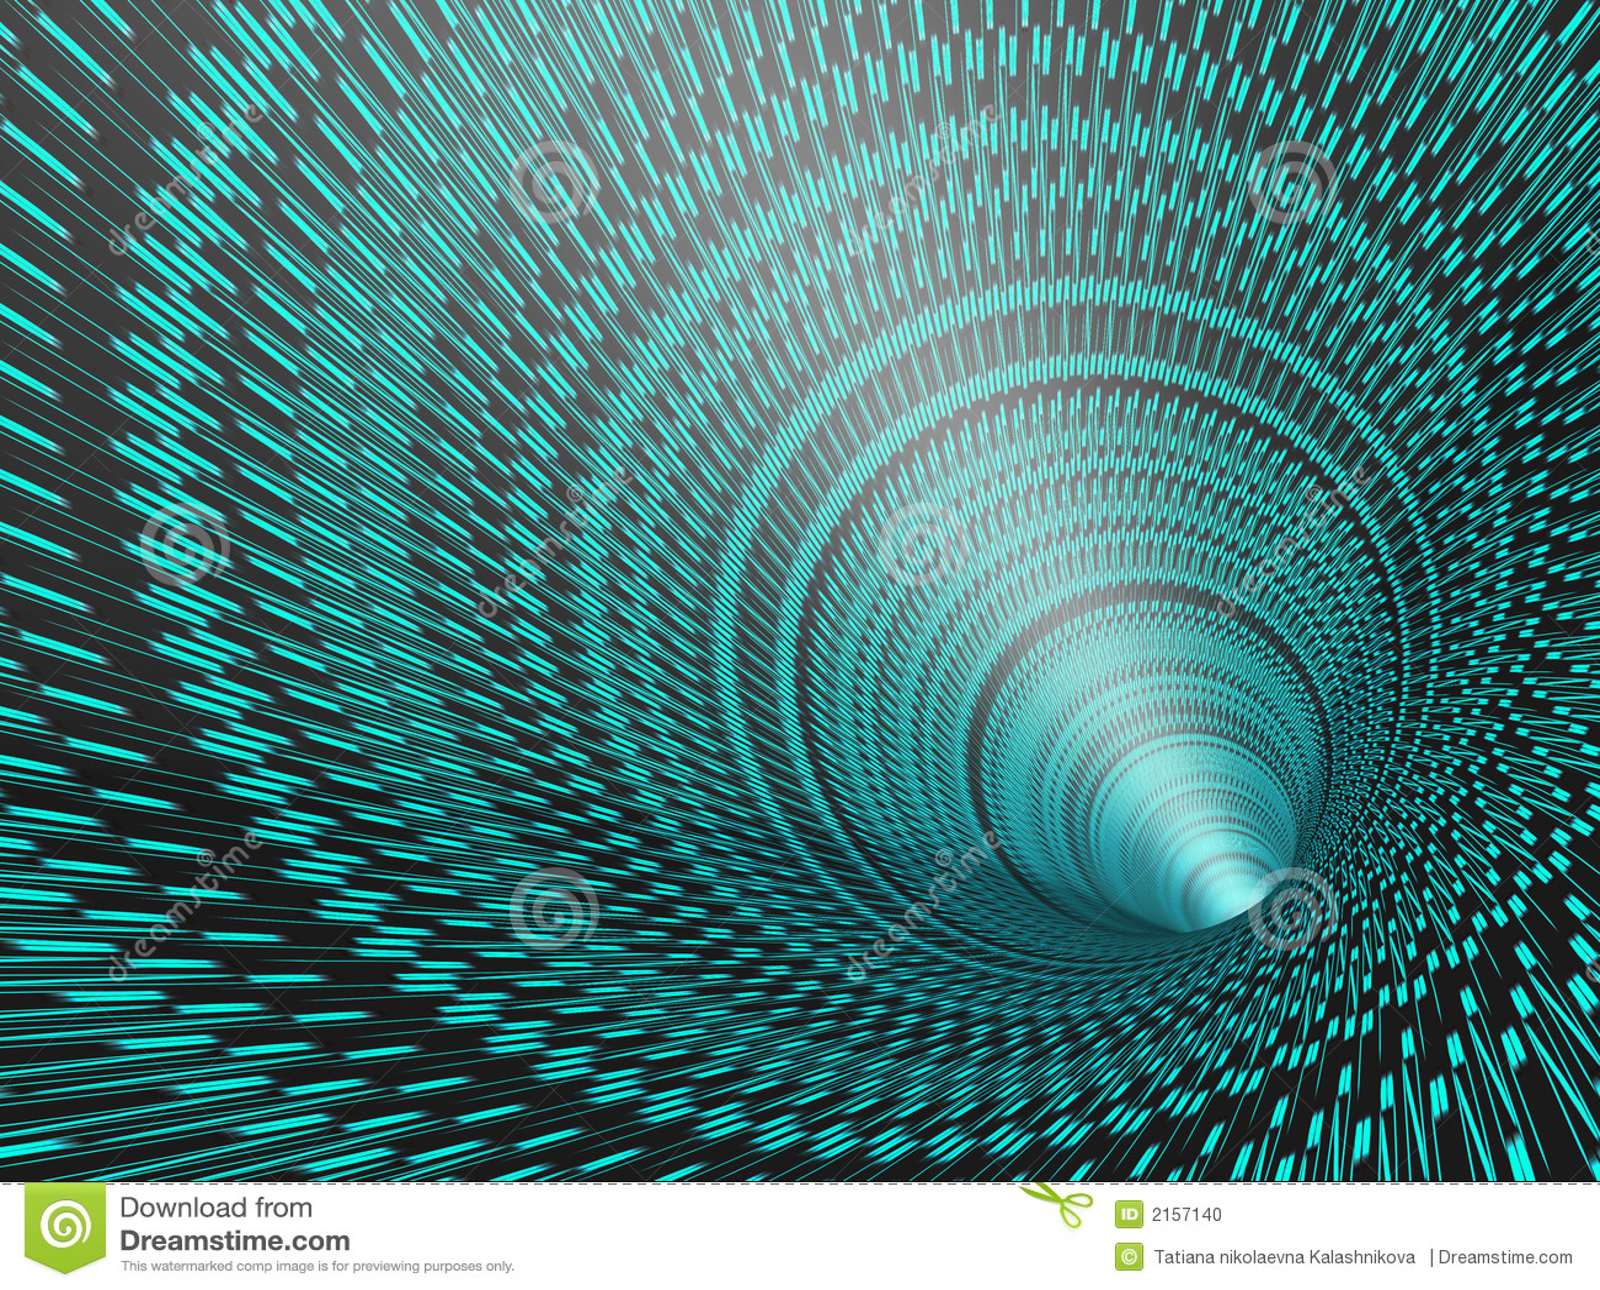 Binary Code Wallpaper Hd Binary Stock Photo Image Of Shadow Lines Design